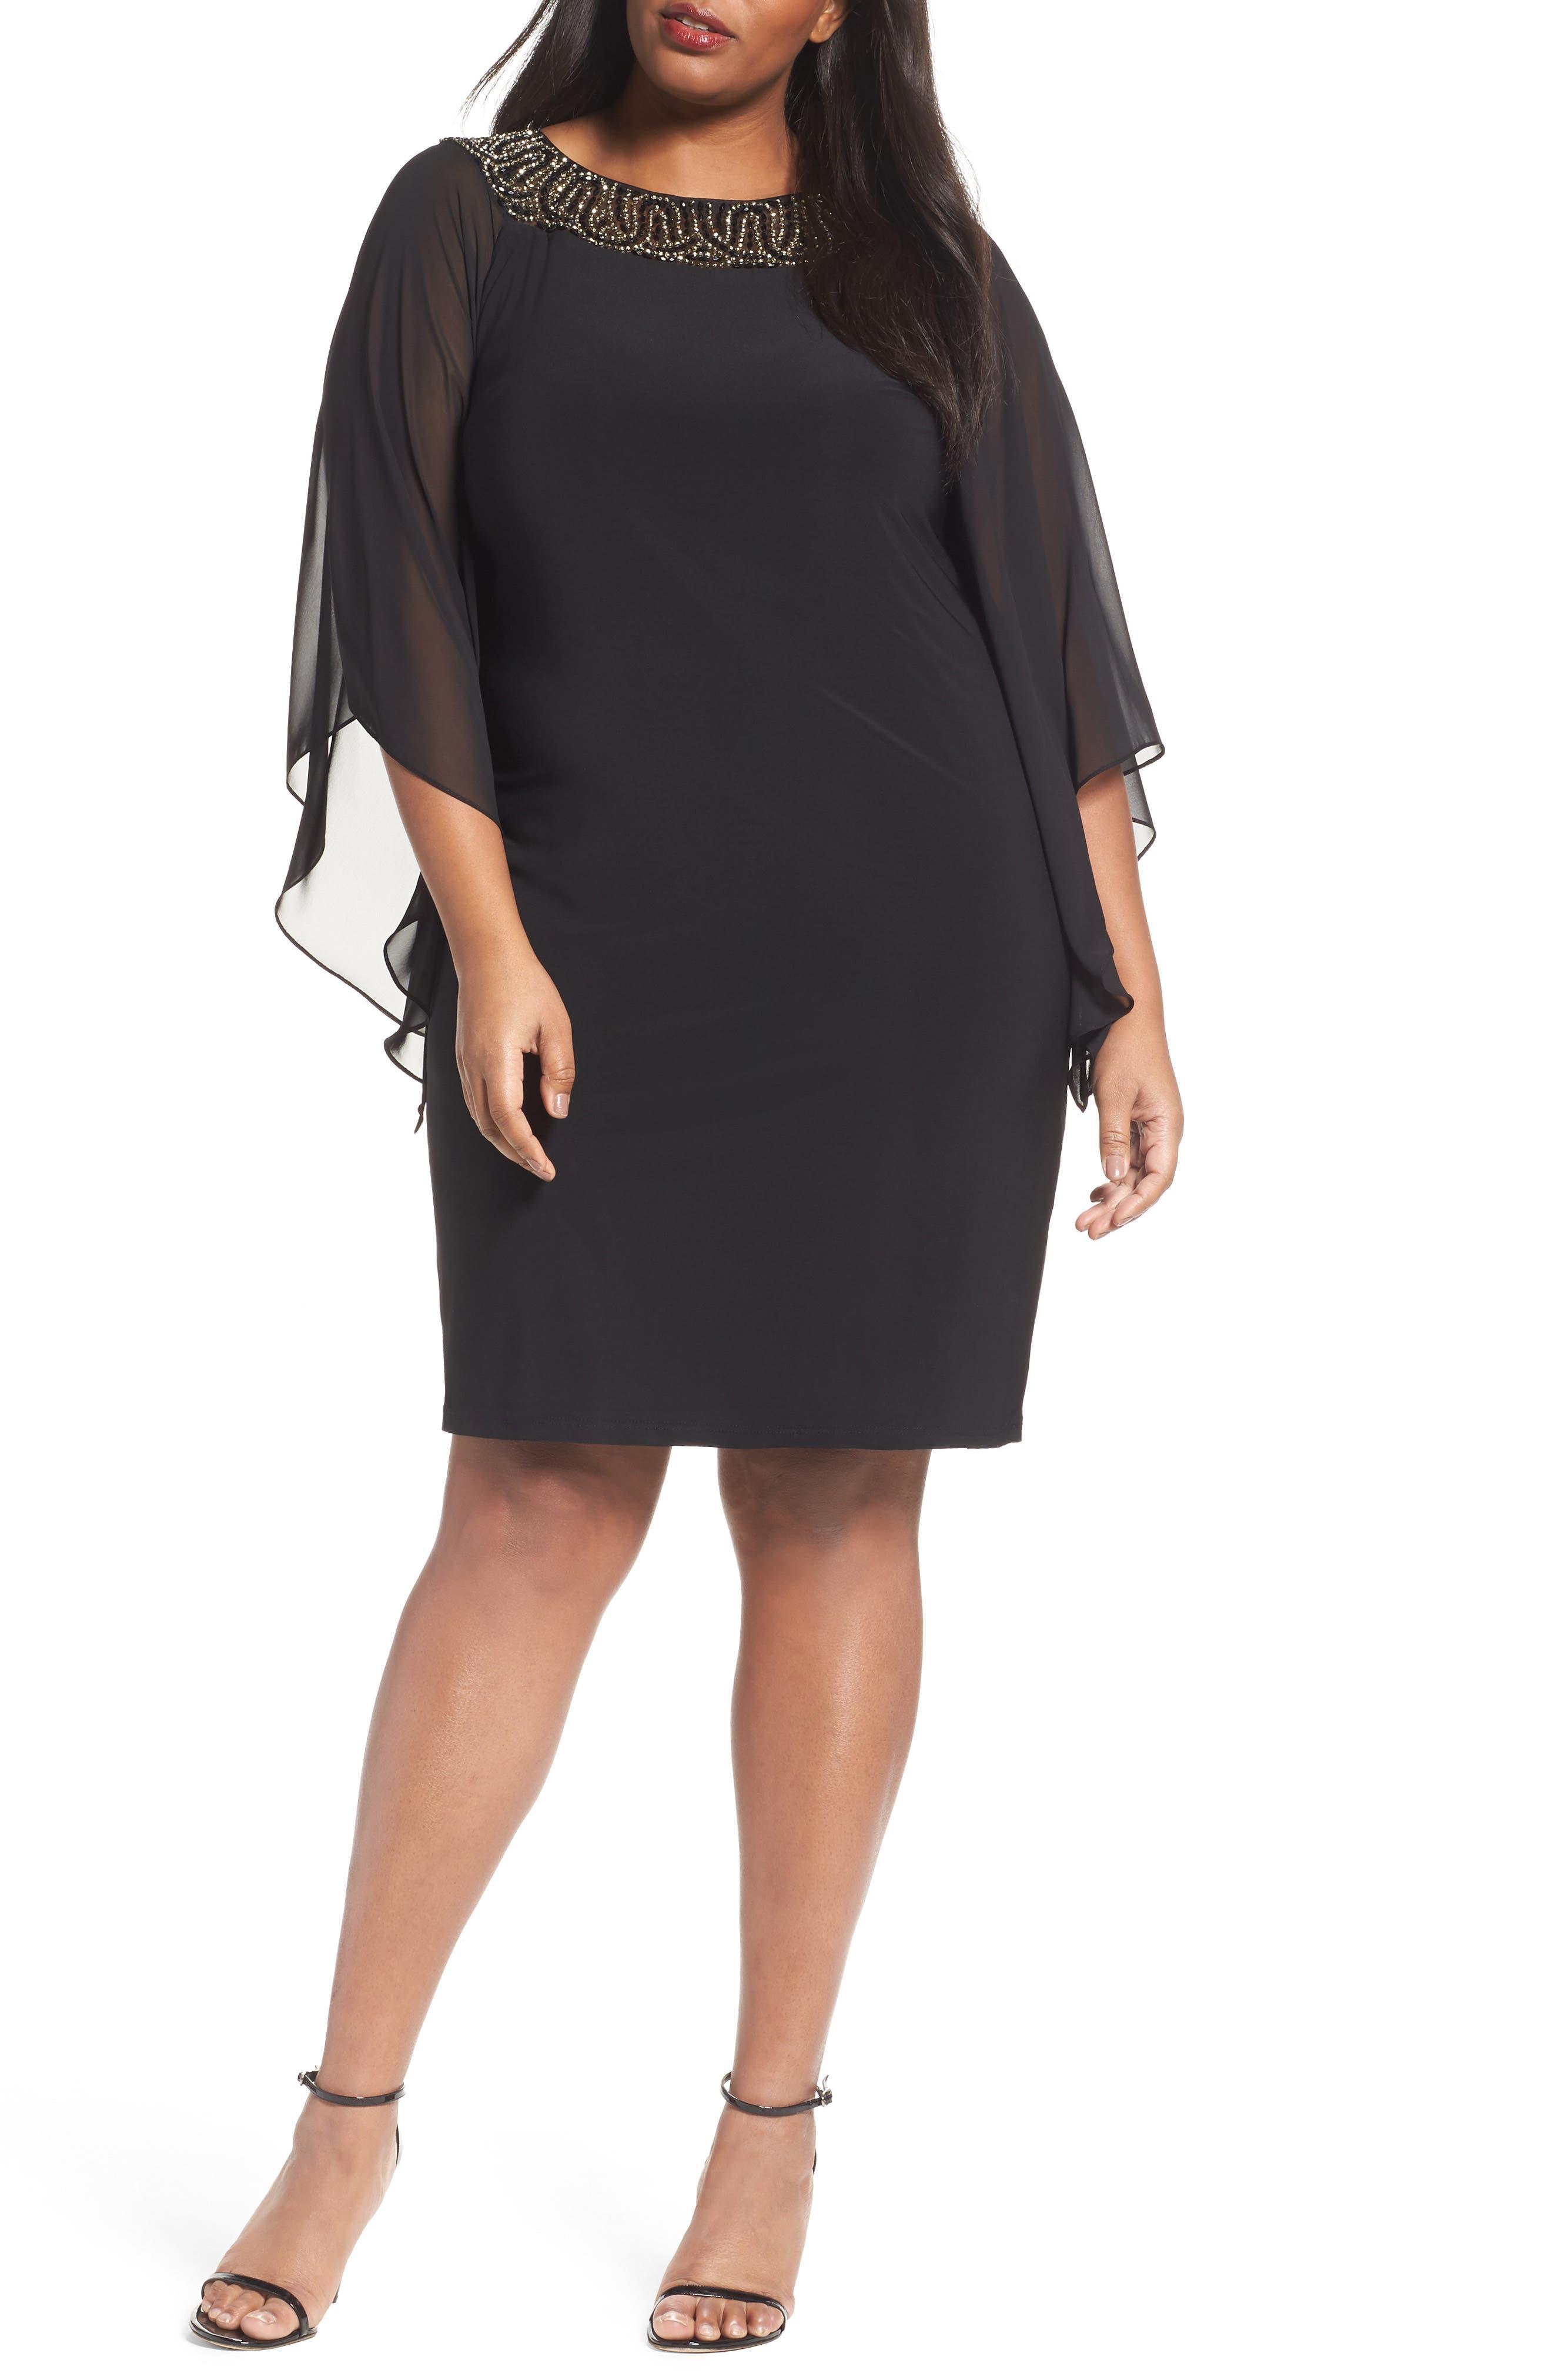 Xscape Beaded Chiffon Sleeve Sheath Dress (Plus Size)